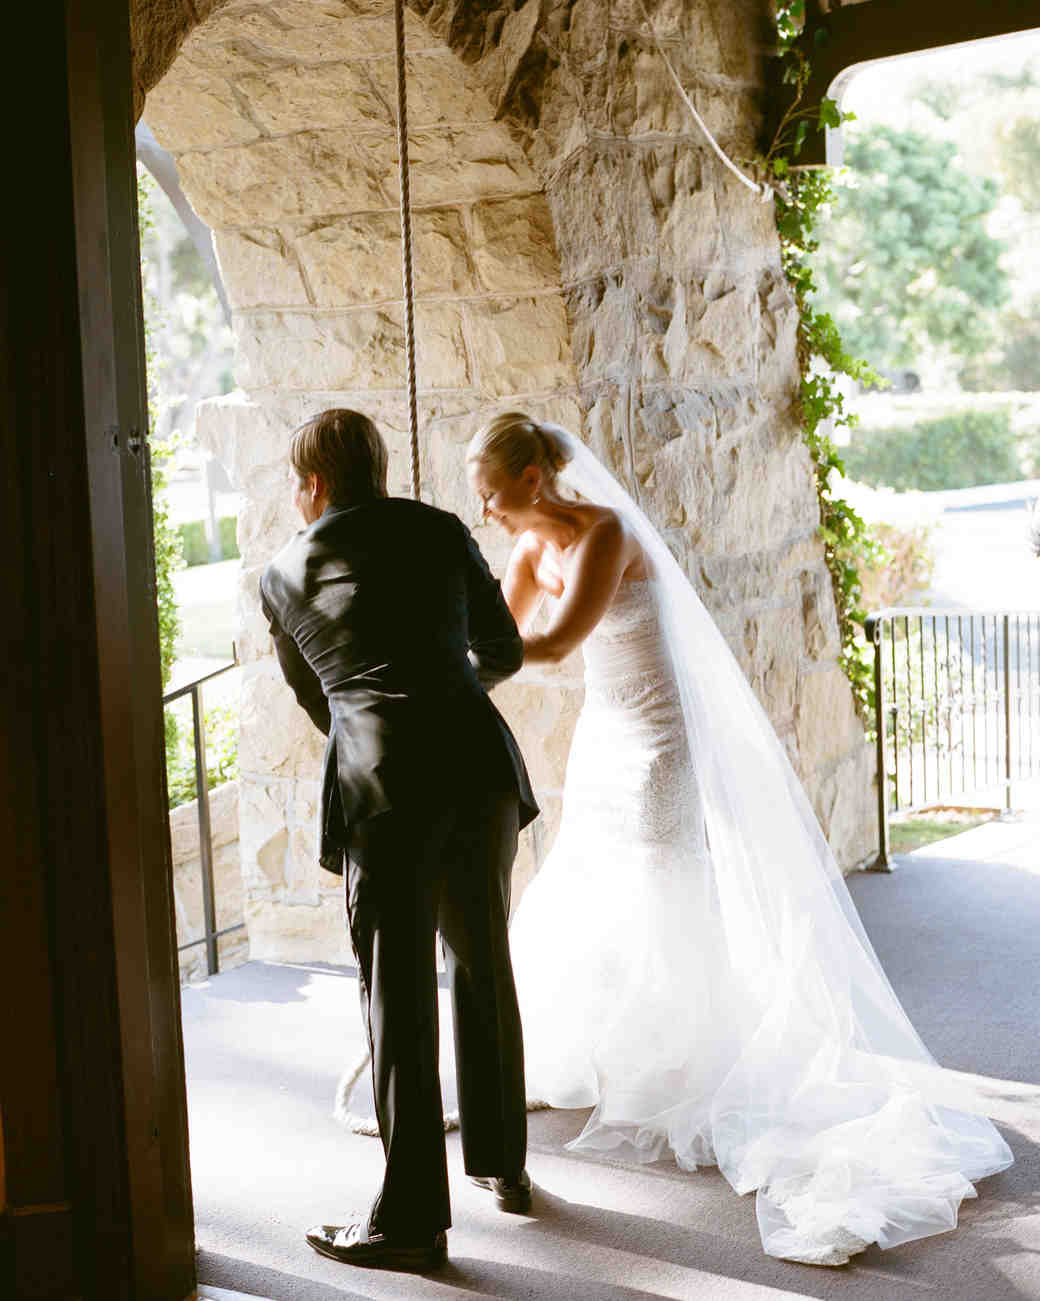 tiffany-david-wedding-bell-1986-s112676-1115.jpg